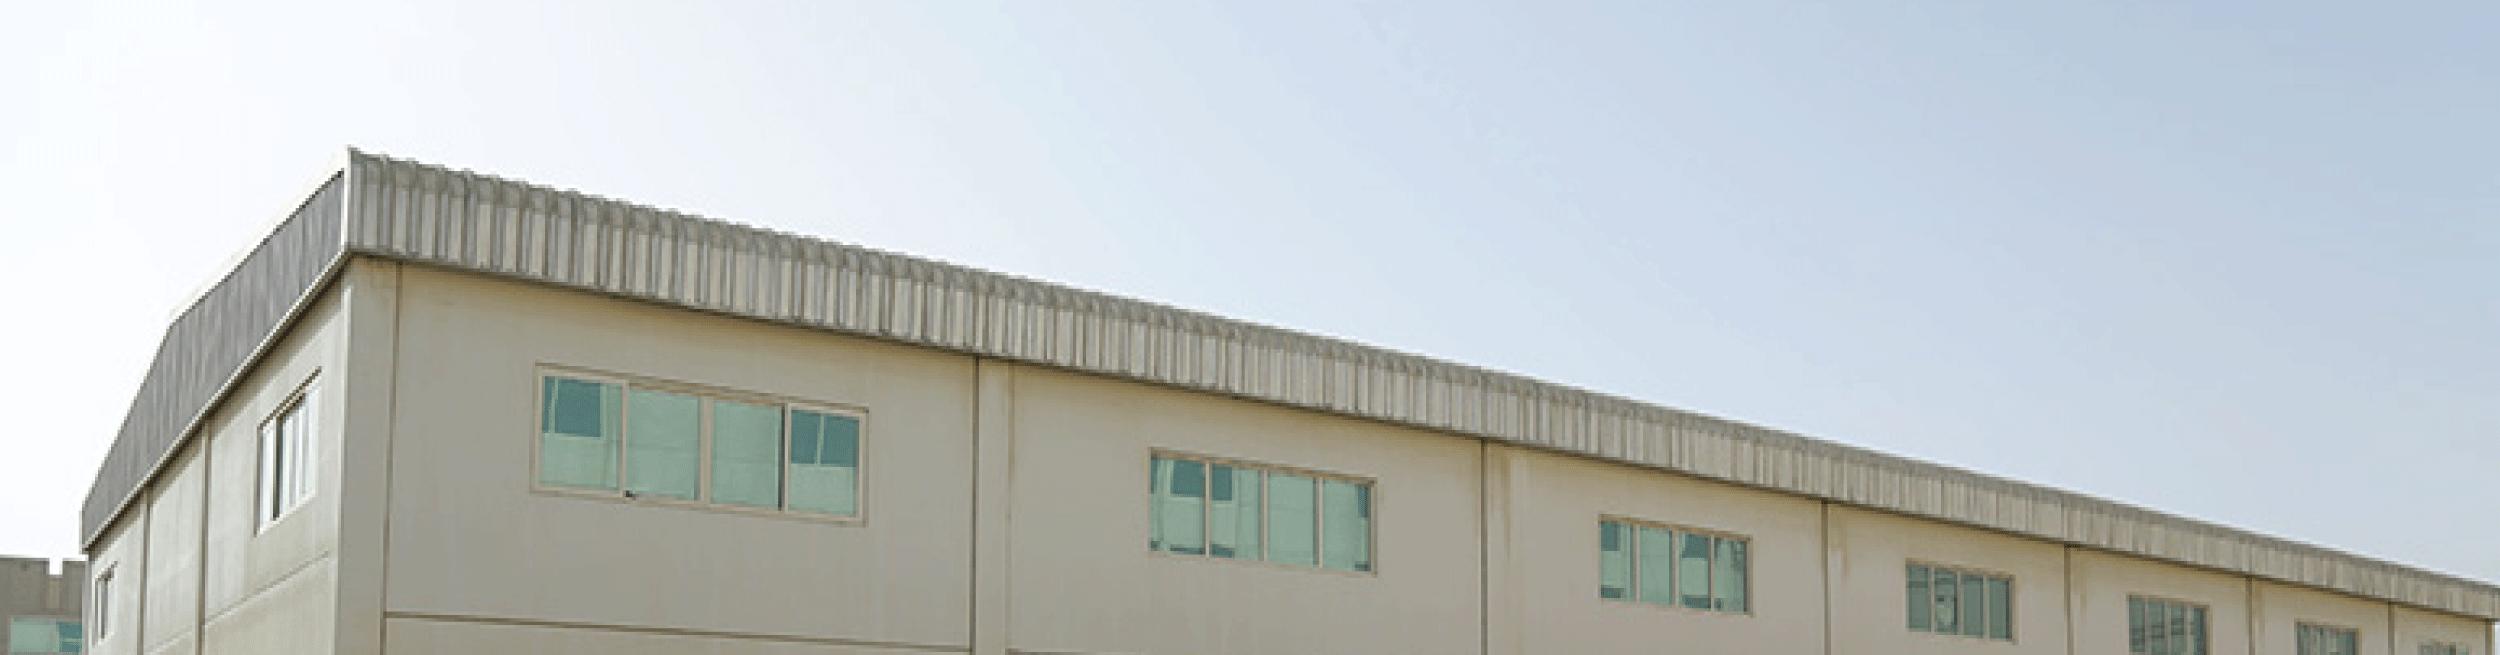 abr-warehouse